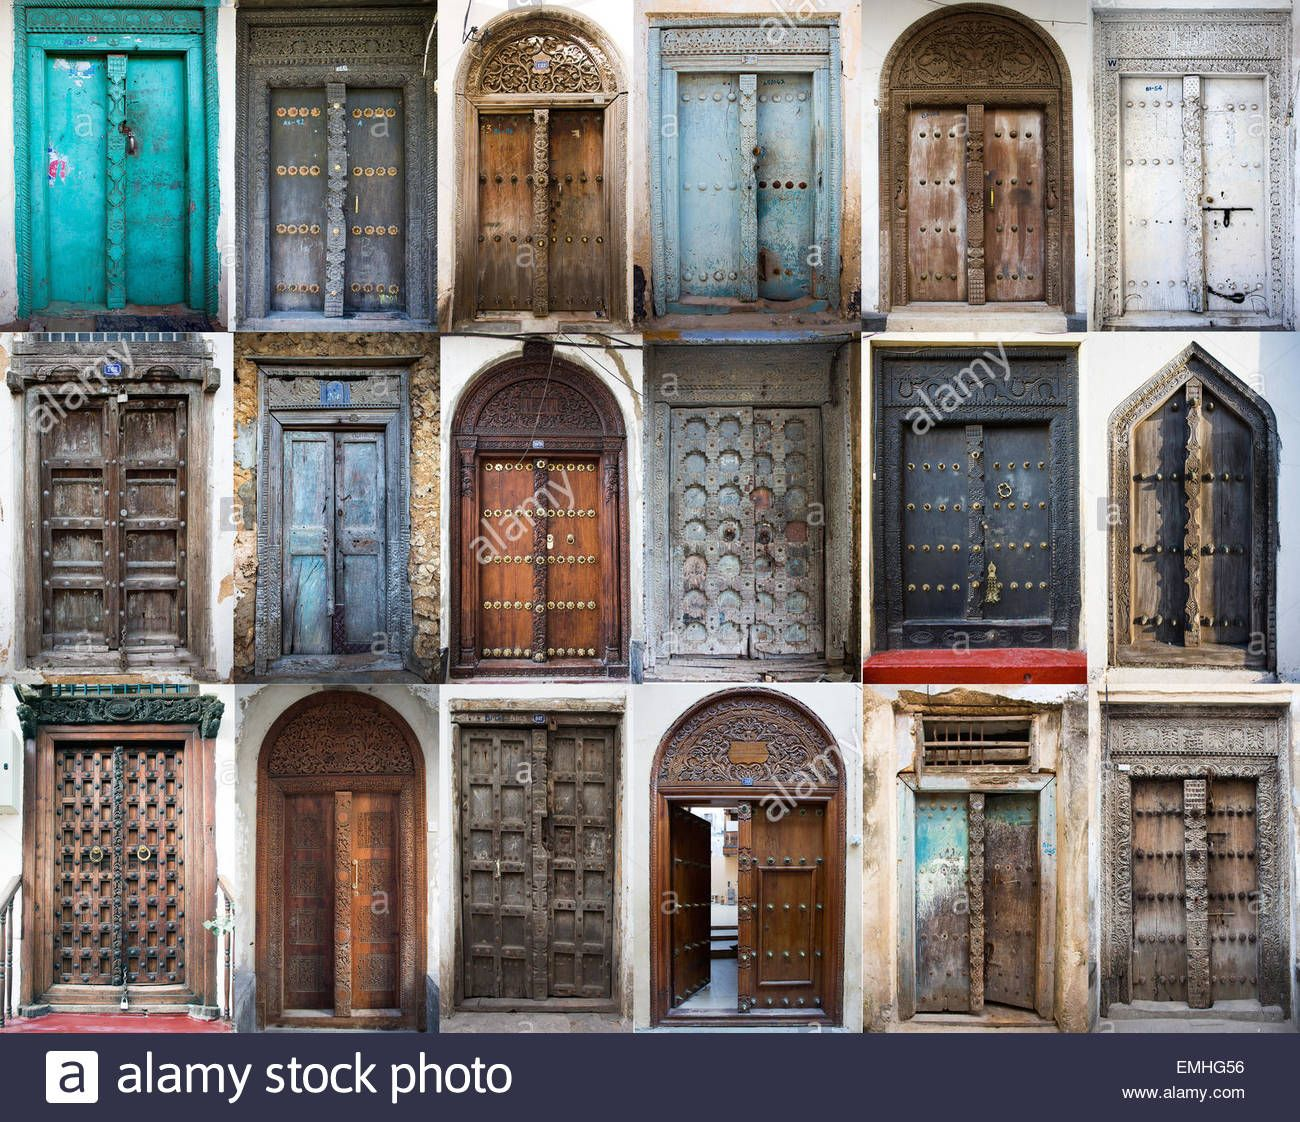 Zanzibar Is Famous For Its Old Wooden Doors Avec Images Deco